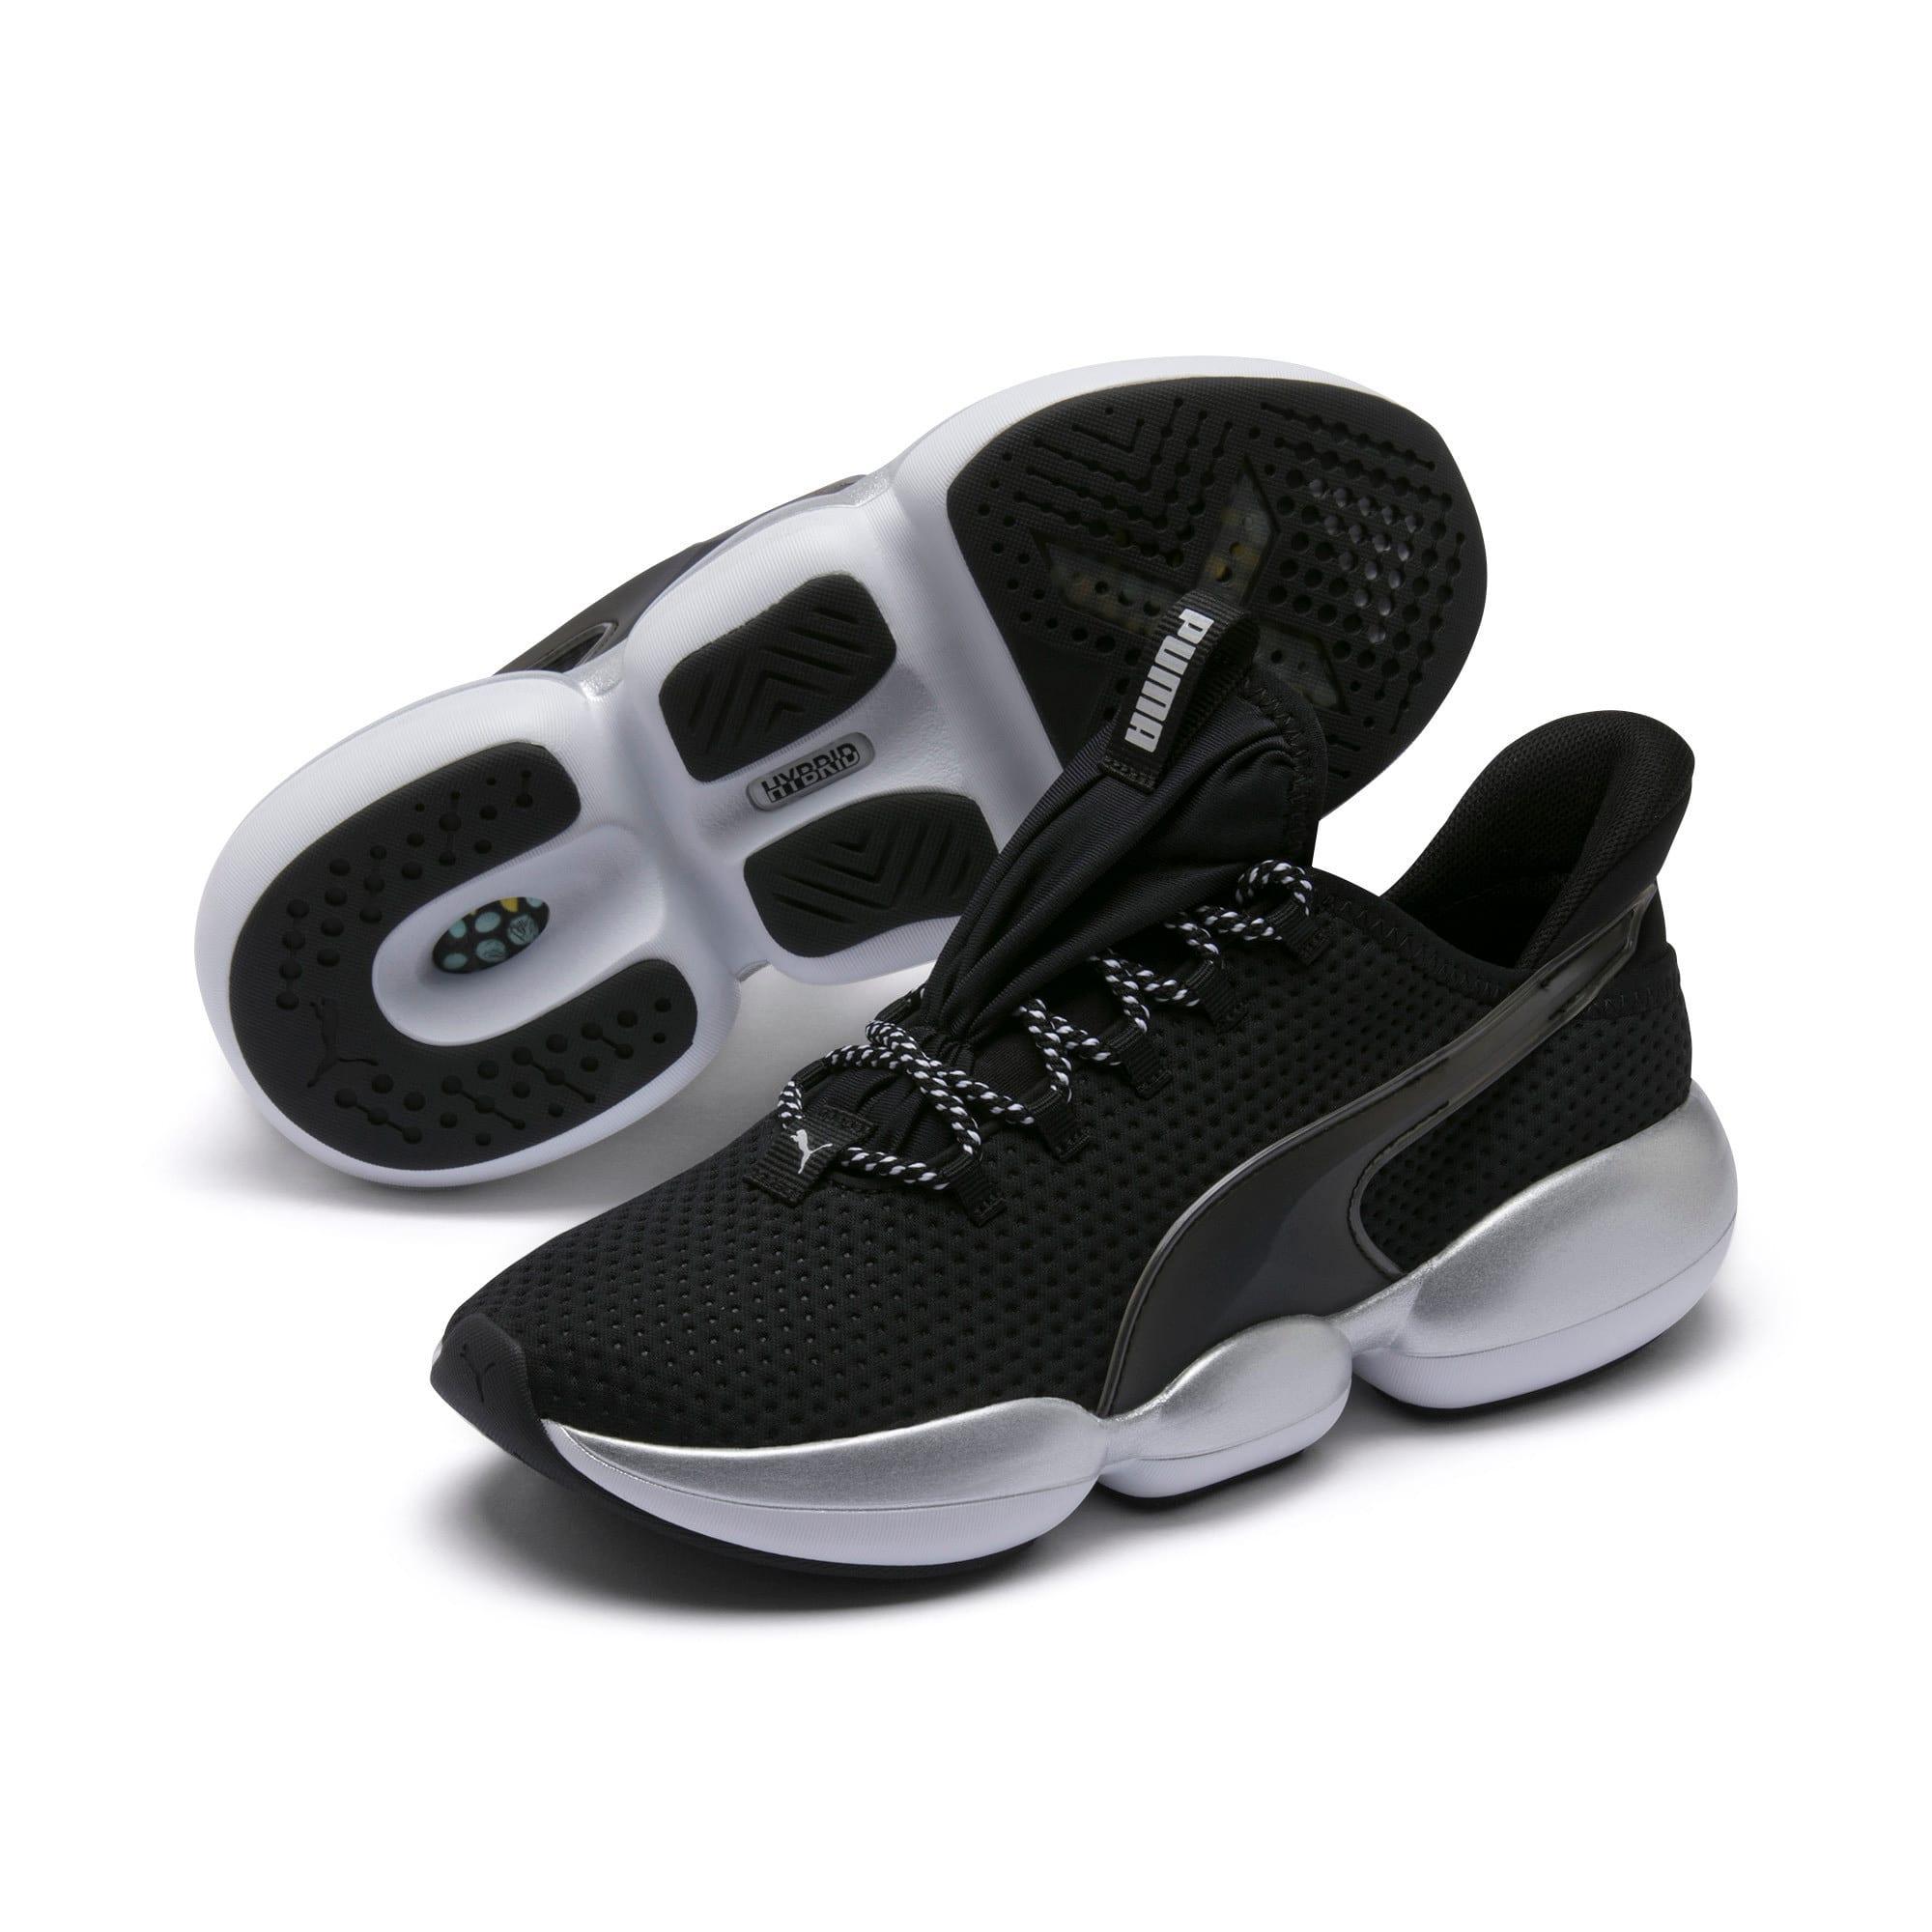 Thumbnail 3 of Mode XT Women's Training Shoes, Puma Black-Puma White, medium